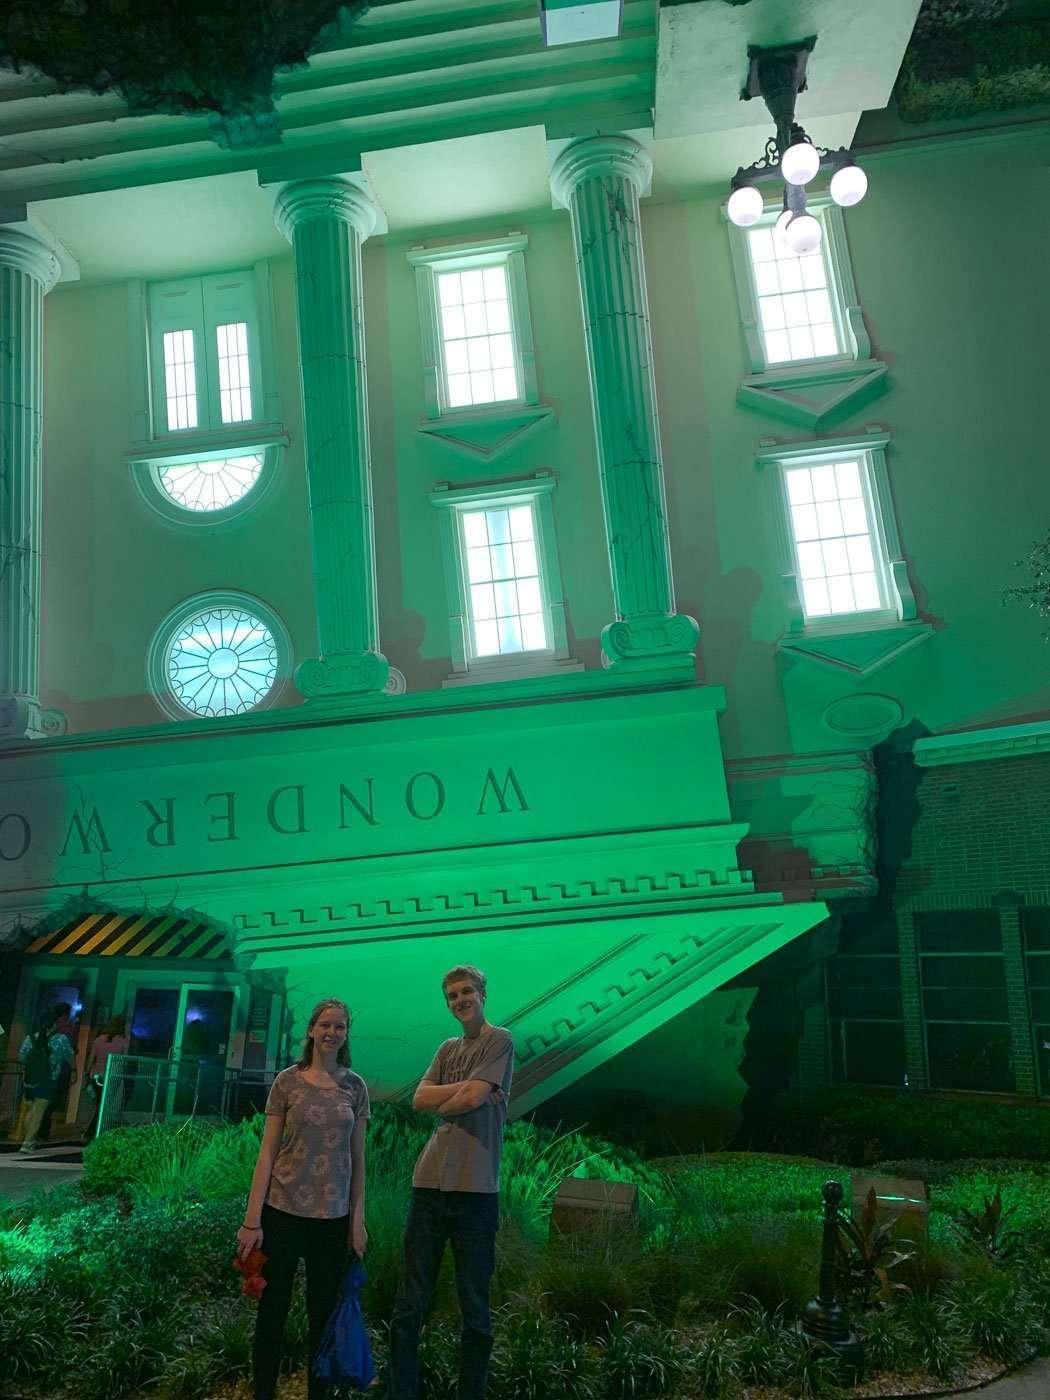 Wonderworks Orlando the Upside Down House at night